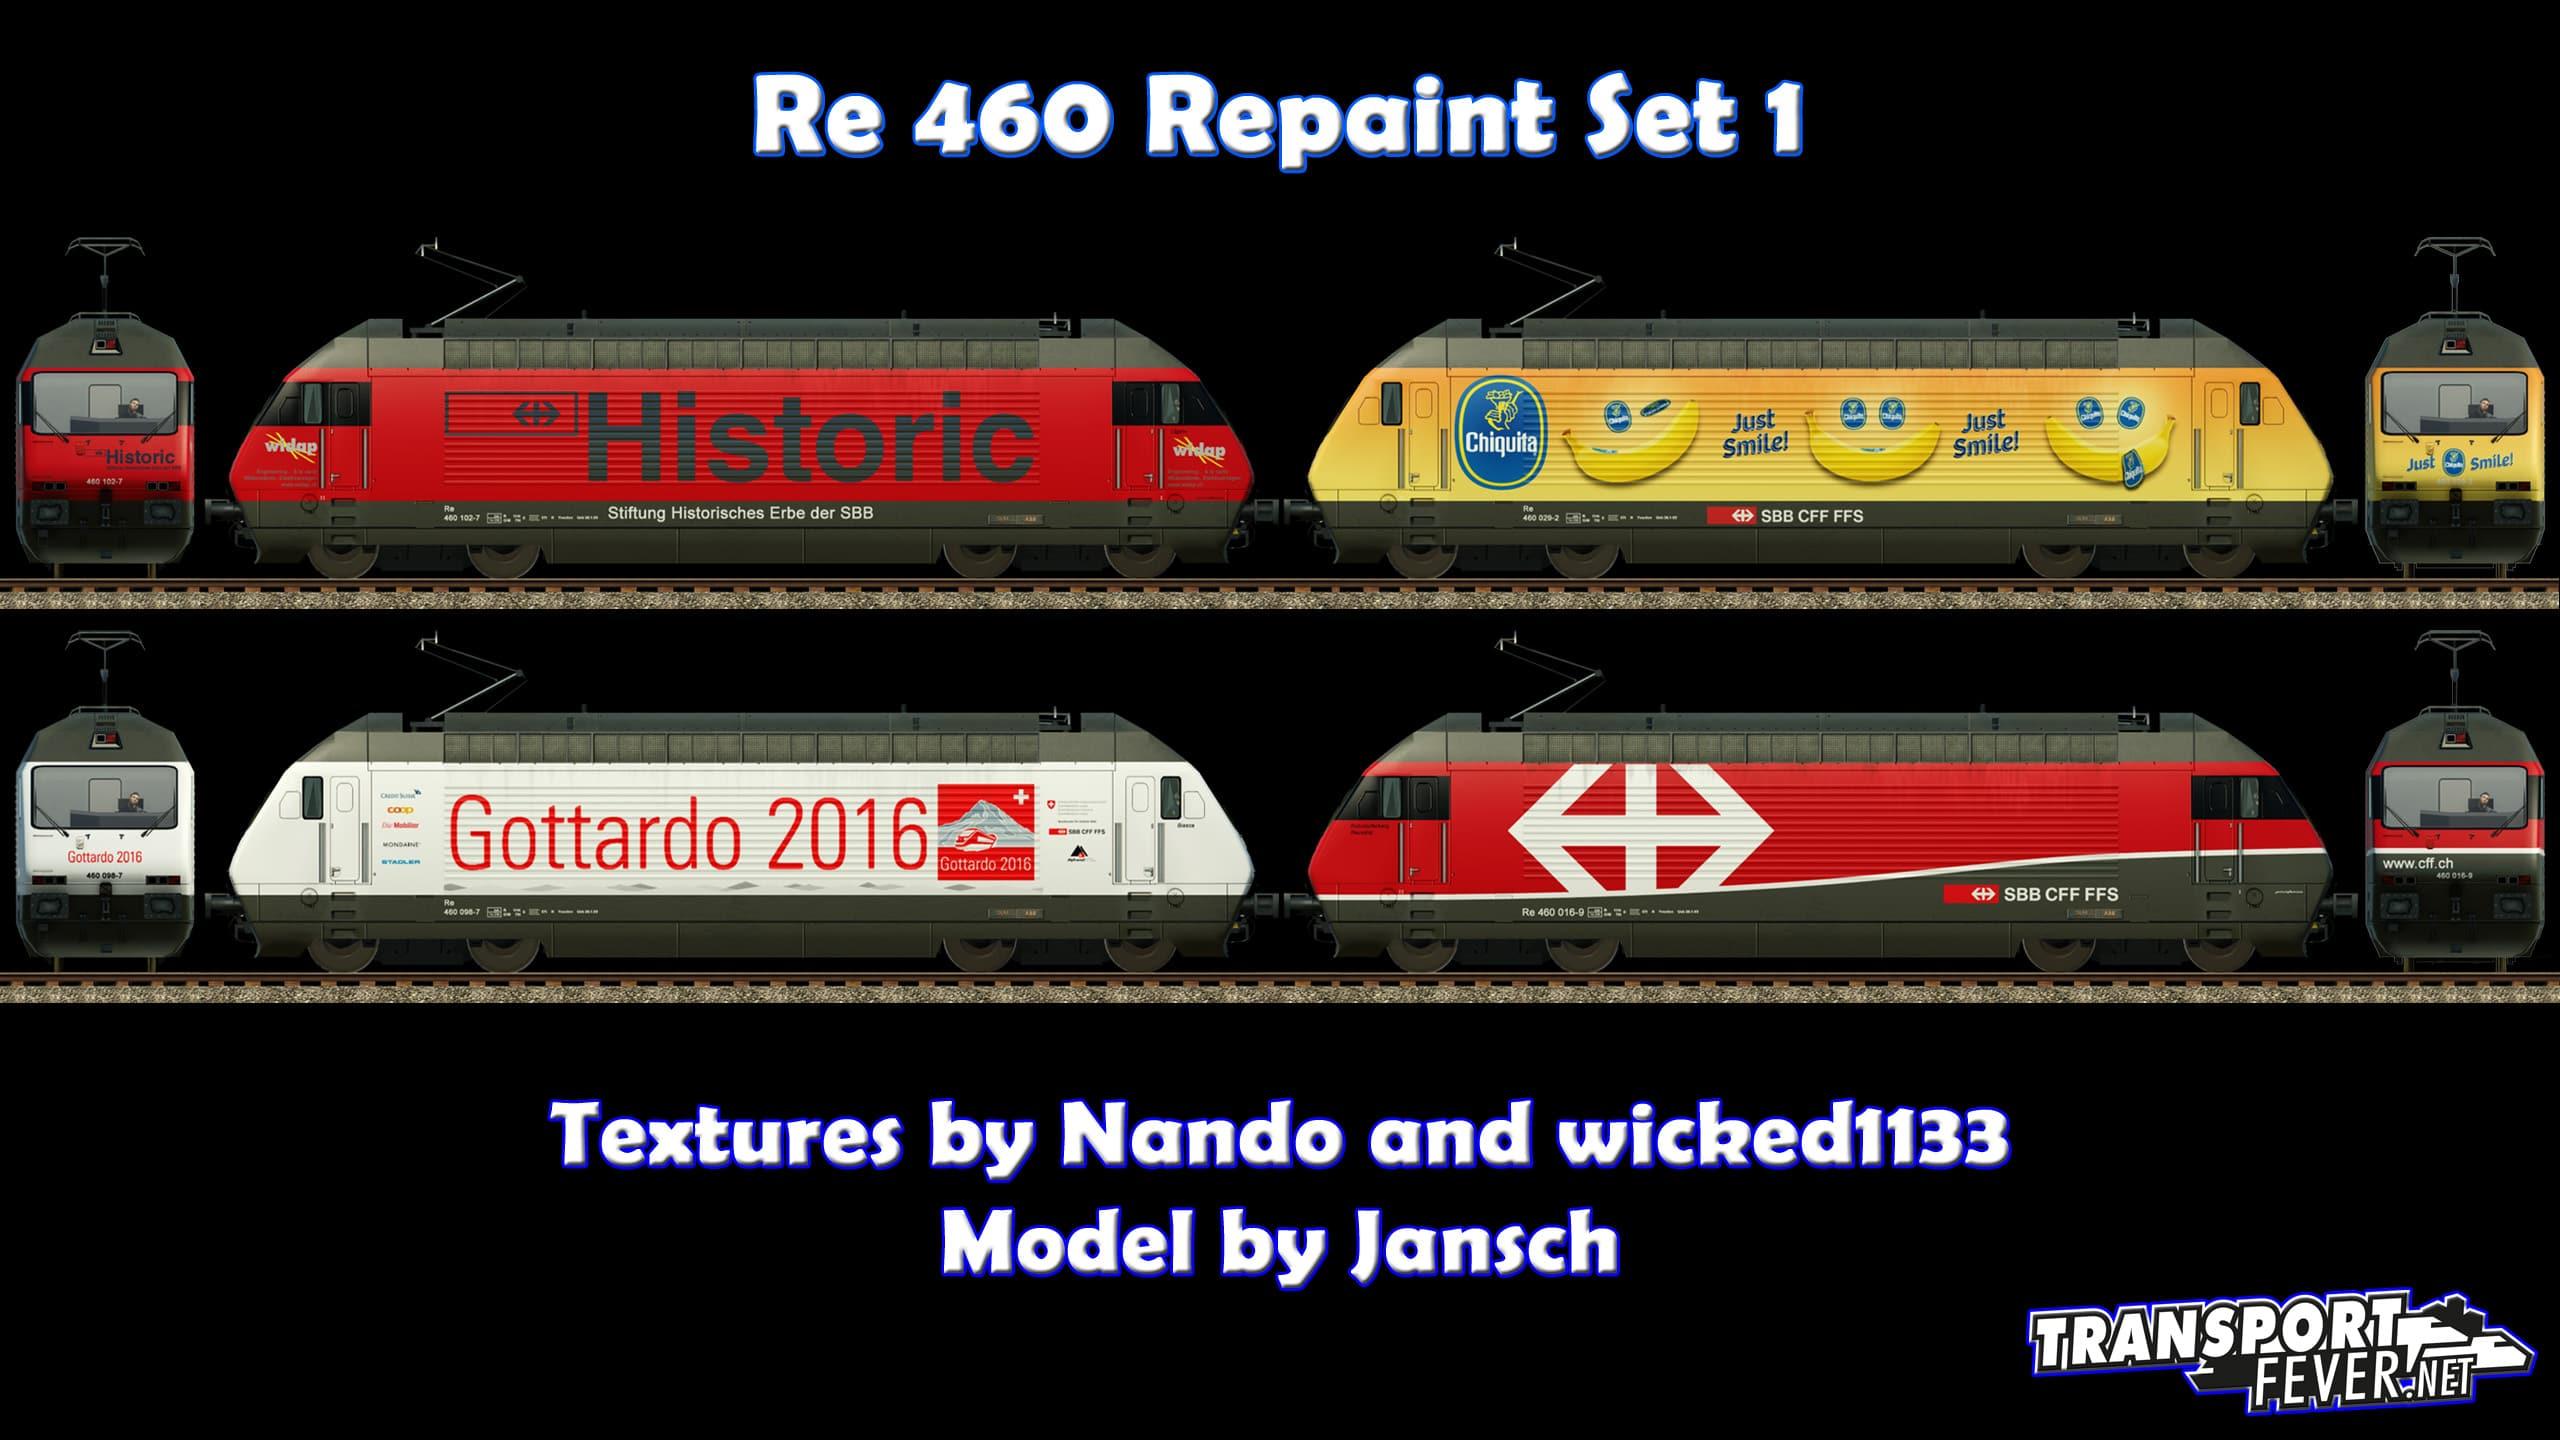 Re 460 Repaint Set 1 - Downloads - Train Fever / Transport Fever ...